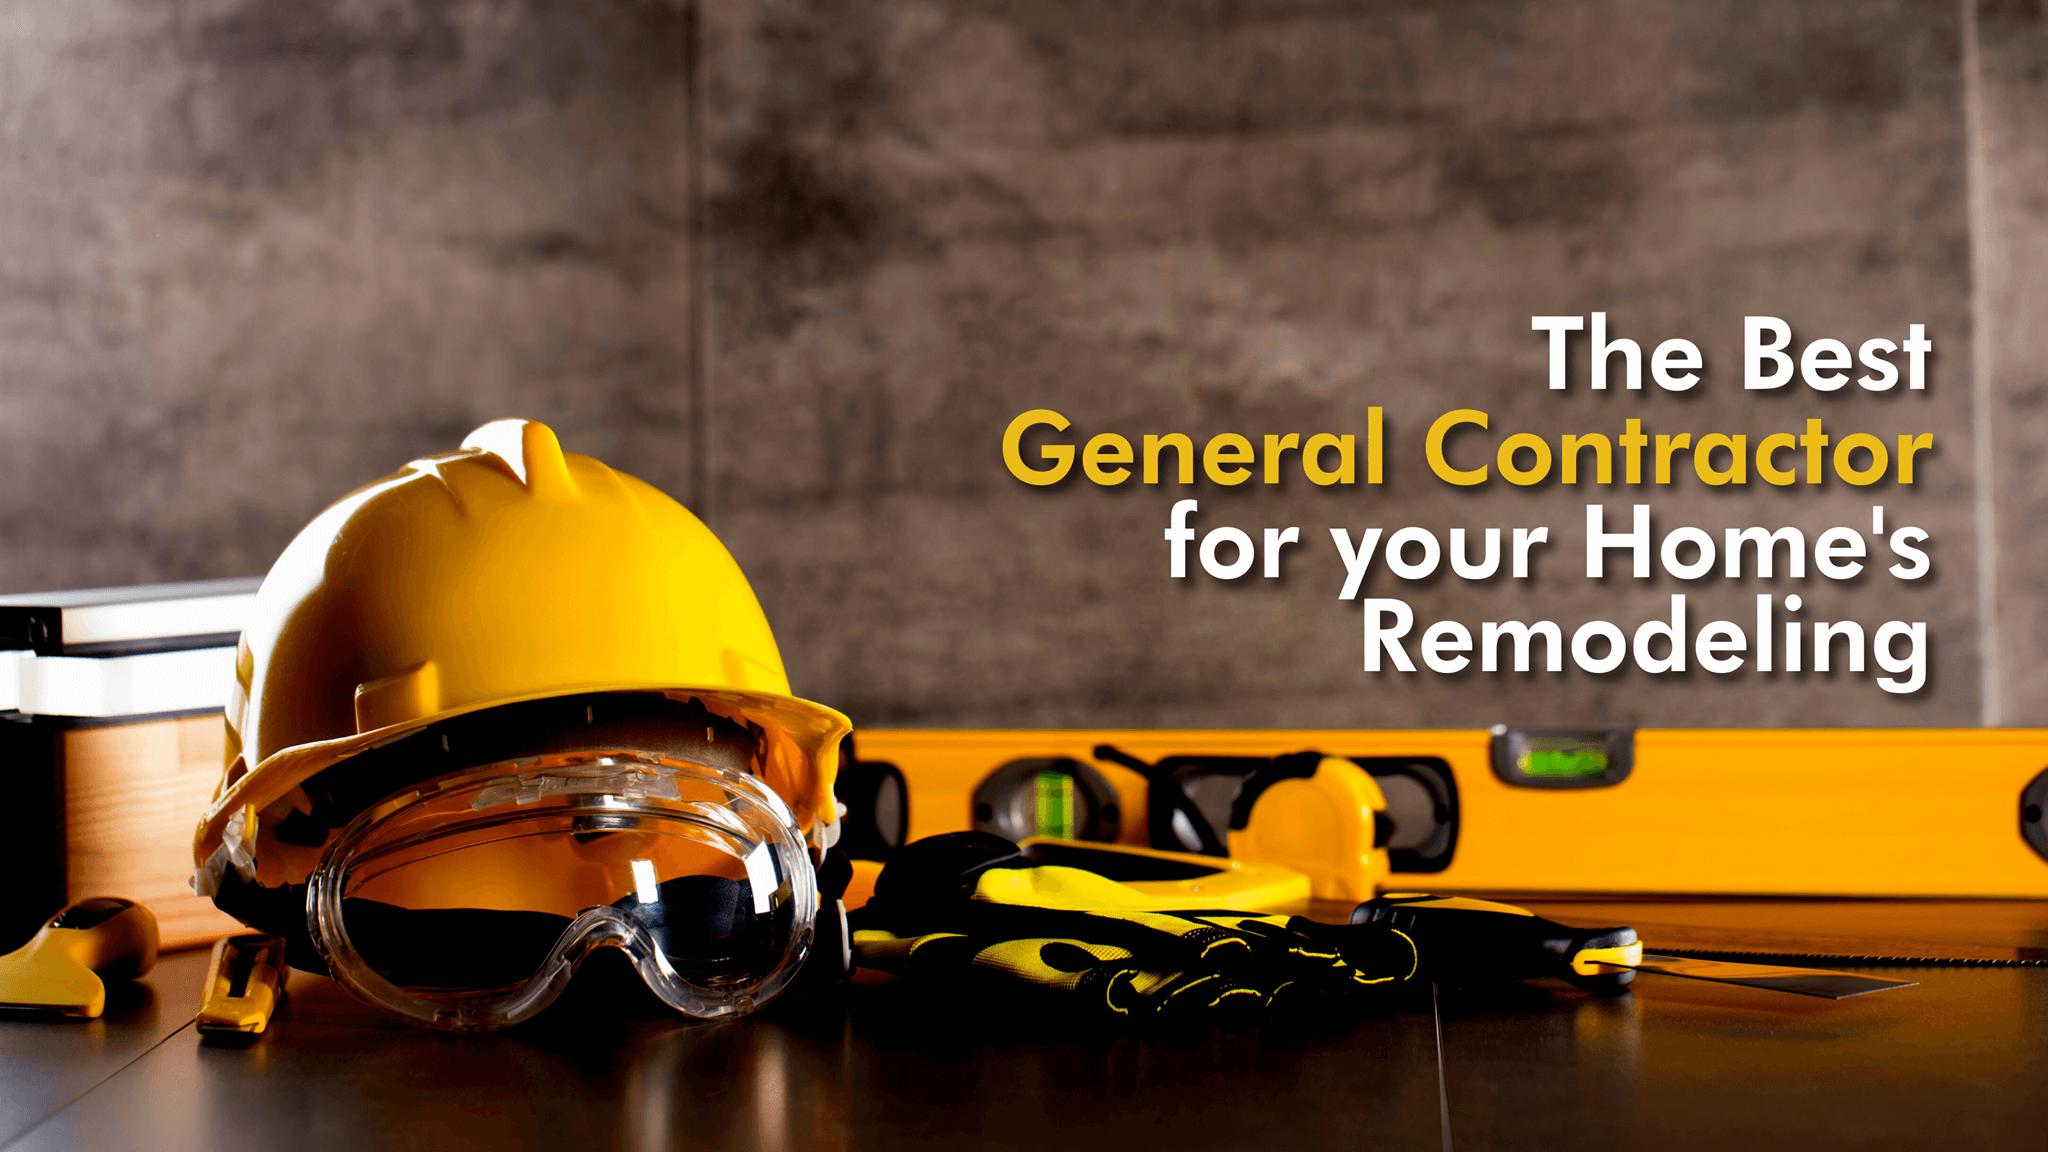 General contartor tools